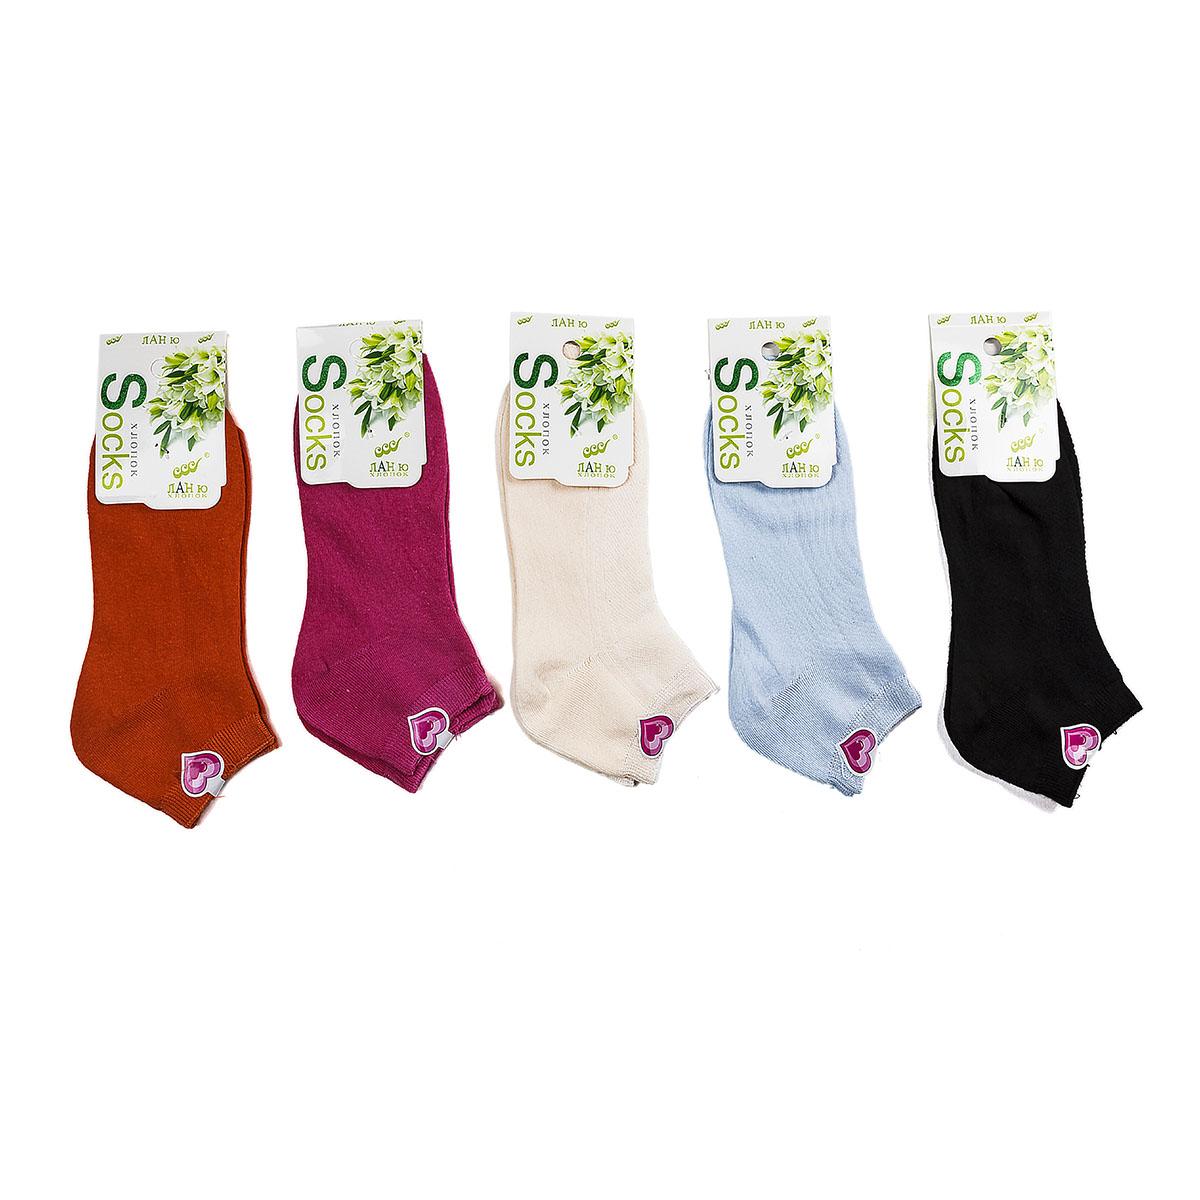 Носки женские «Ланю», цвет РозовыйНоски и чулки<br><br><br>Тип: Жен. носки<br>Размер: 38-42<br>Материал: Трикотаж